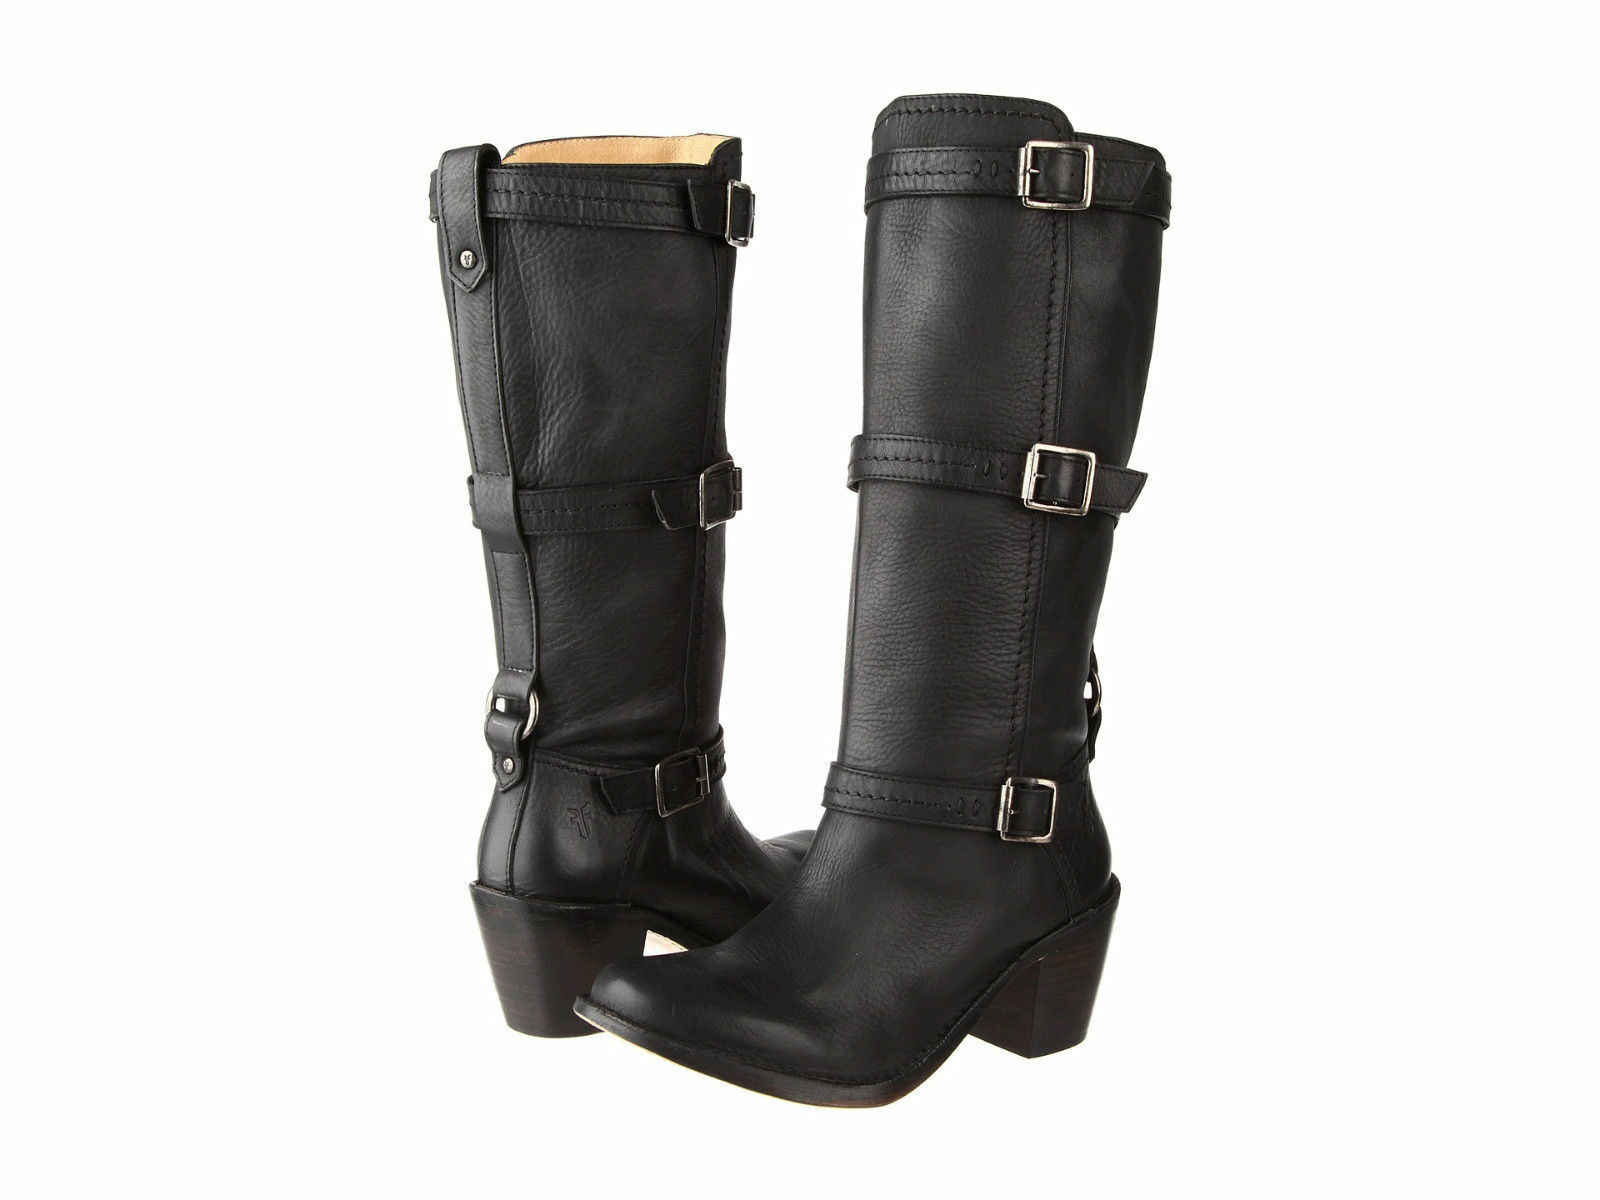 Frye Womens Carmen 3 Strap Black-Brown-Tan Pull-On Fashion Knee-High Boots